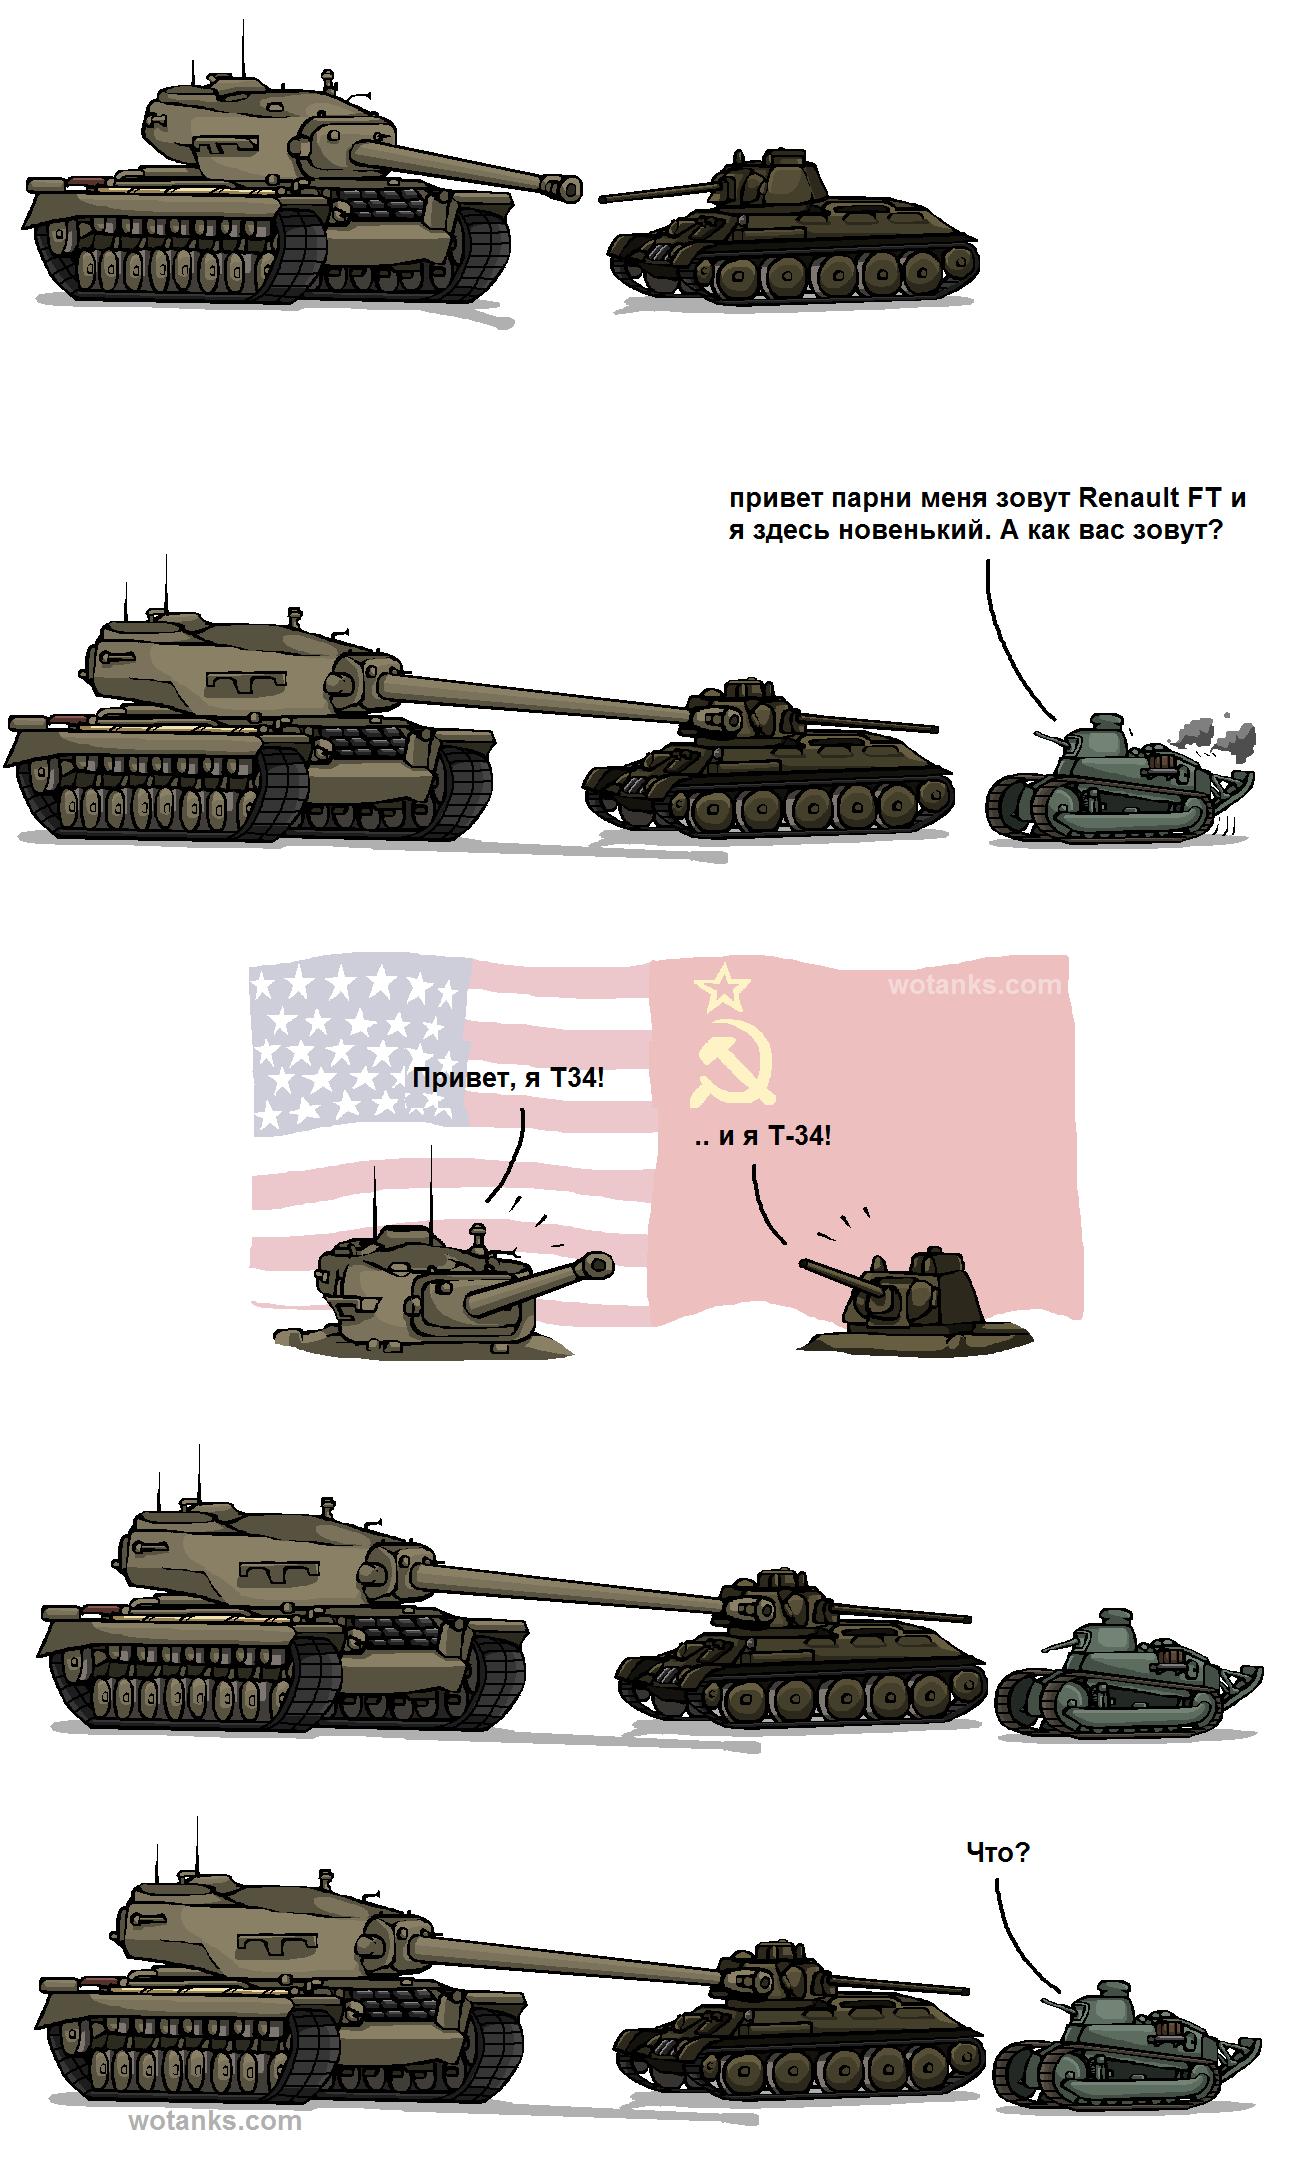 Нажмите на изображение для увеличения Название: Конфликт названий танков в World of Tanks.png Просмотров: 13 Размер:152.4 Кб ID:1157